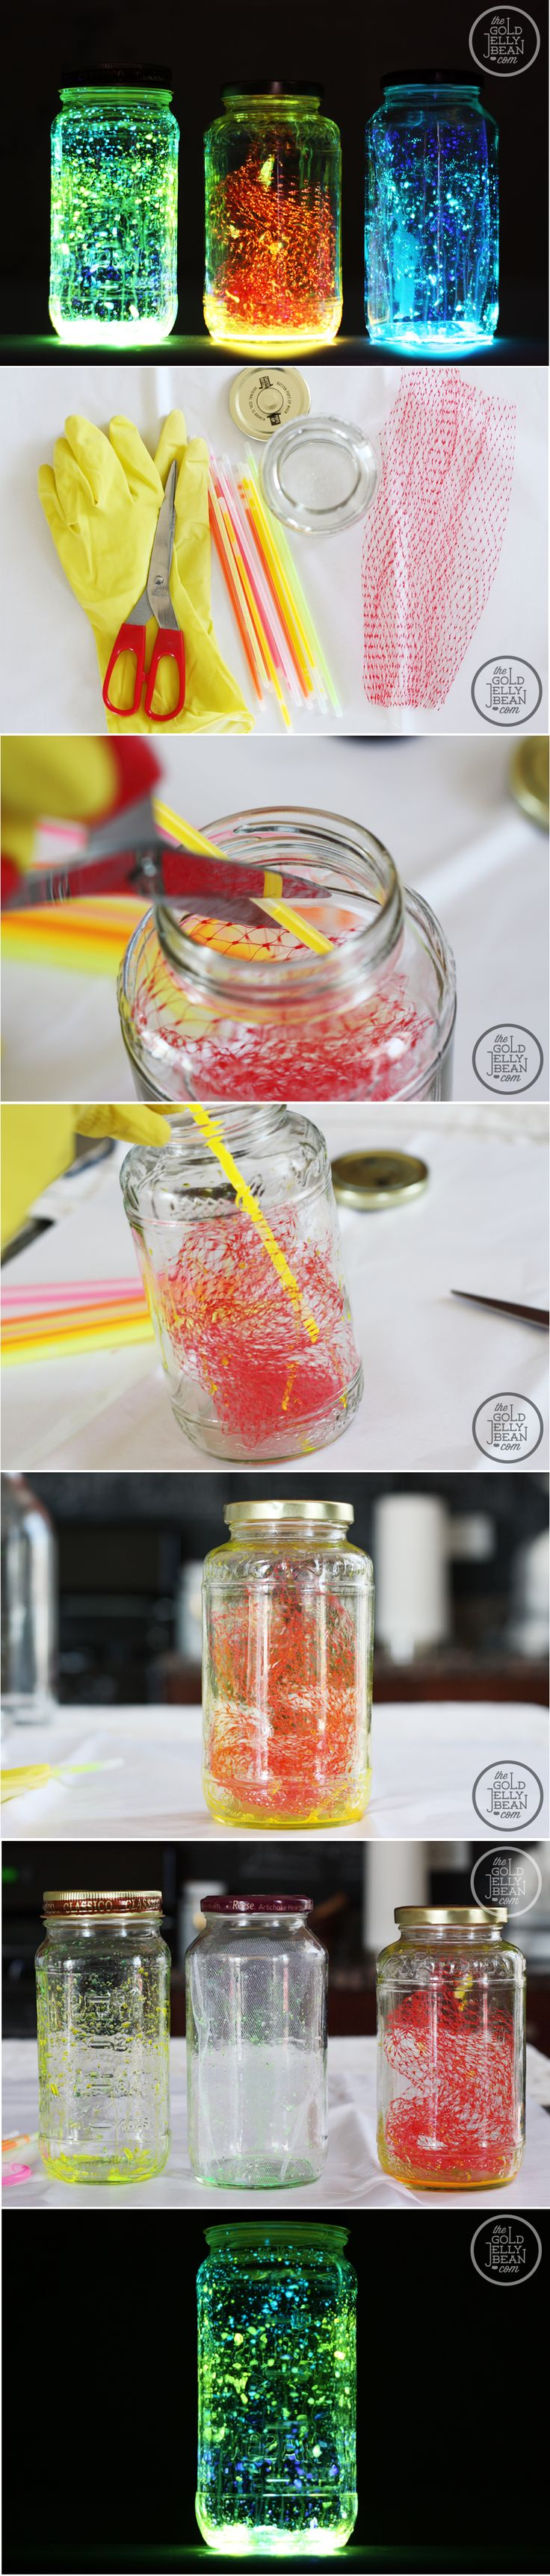 How To Make Colorful Glowing Mason Jar Lights